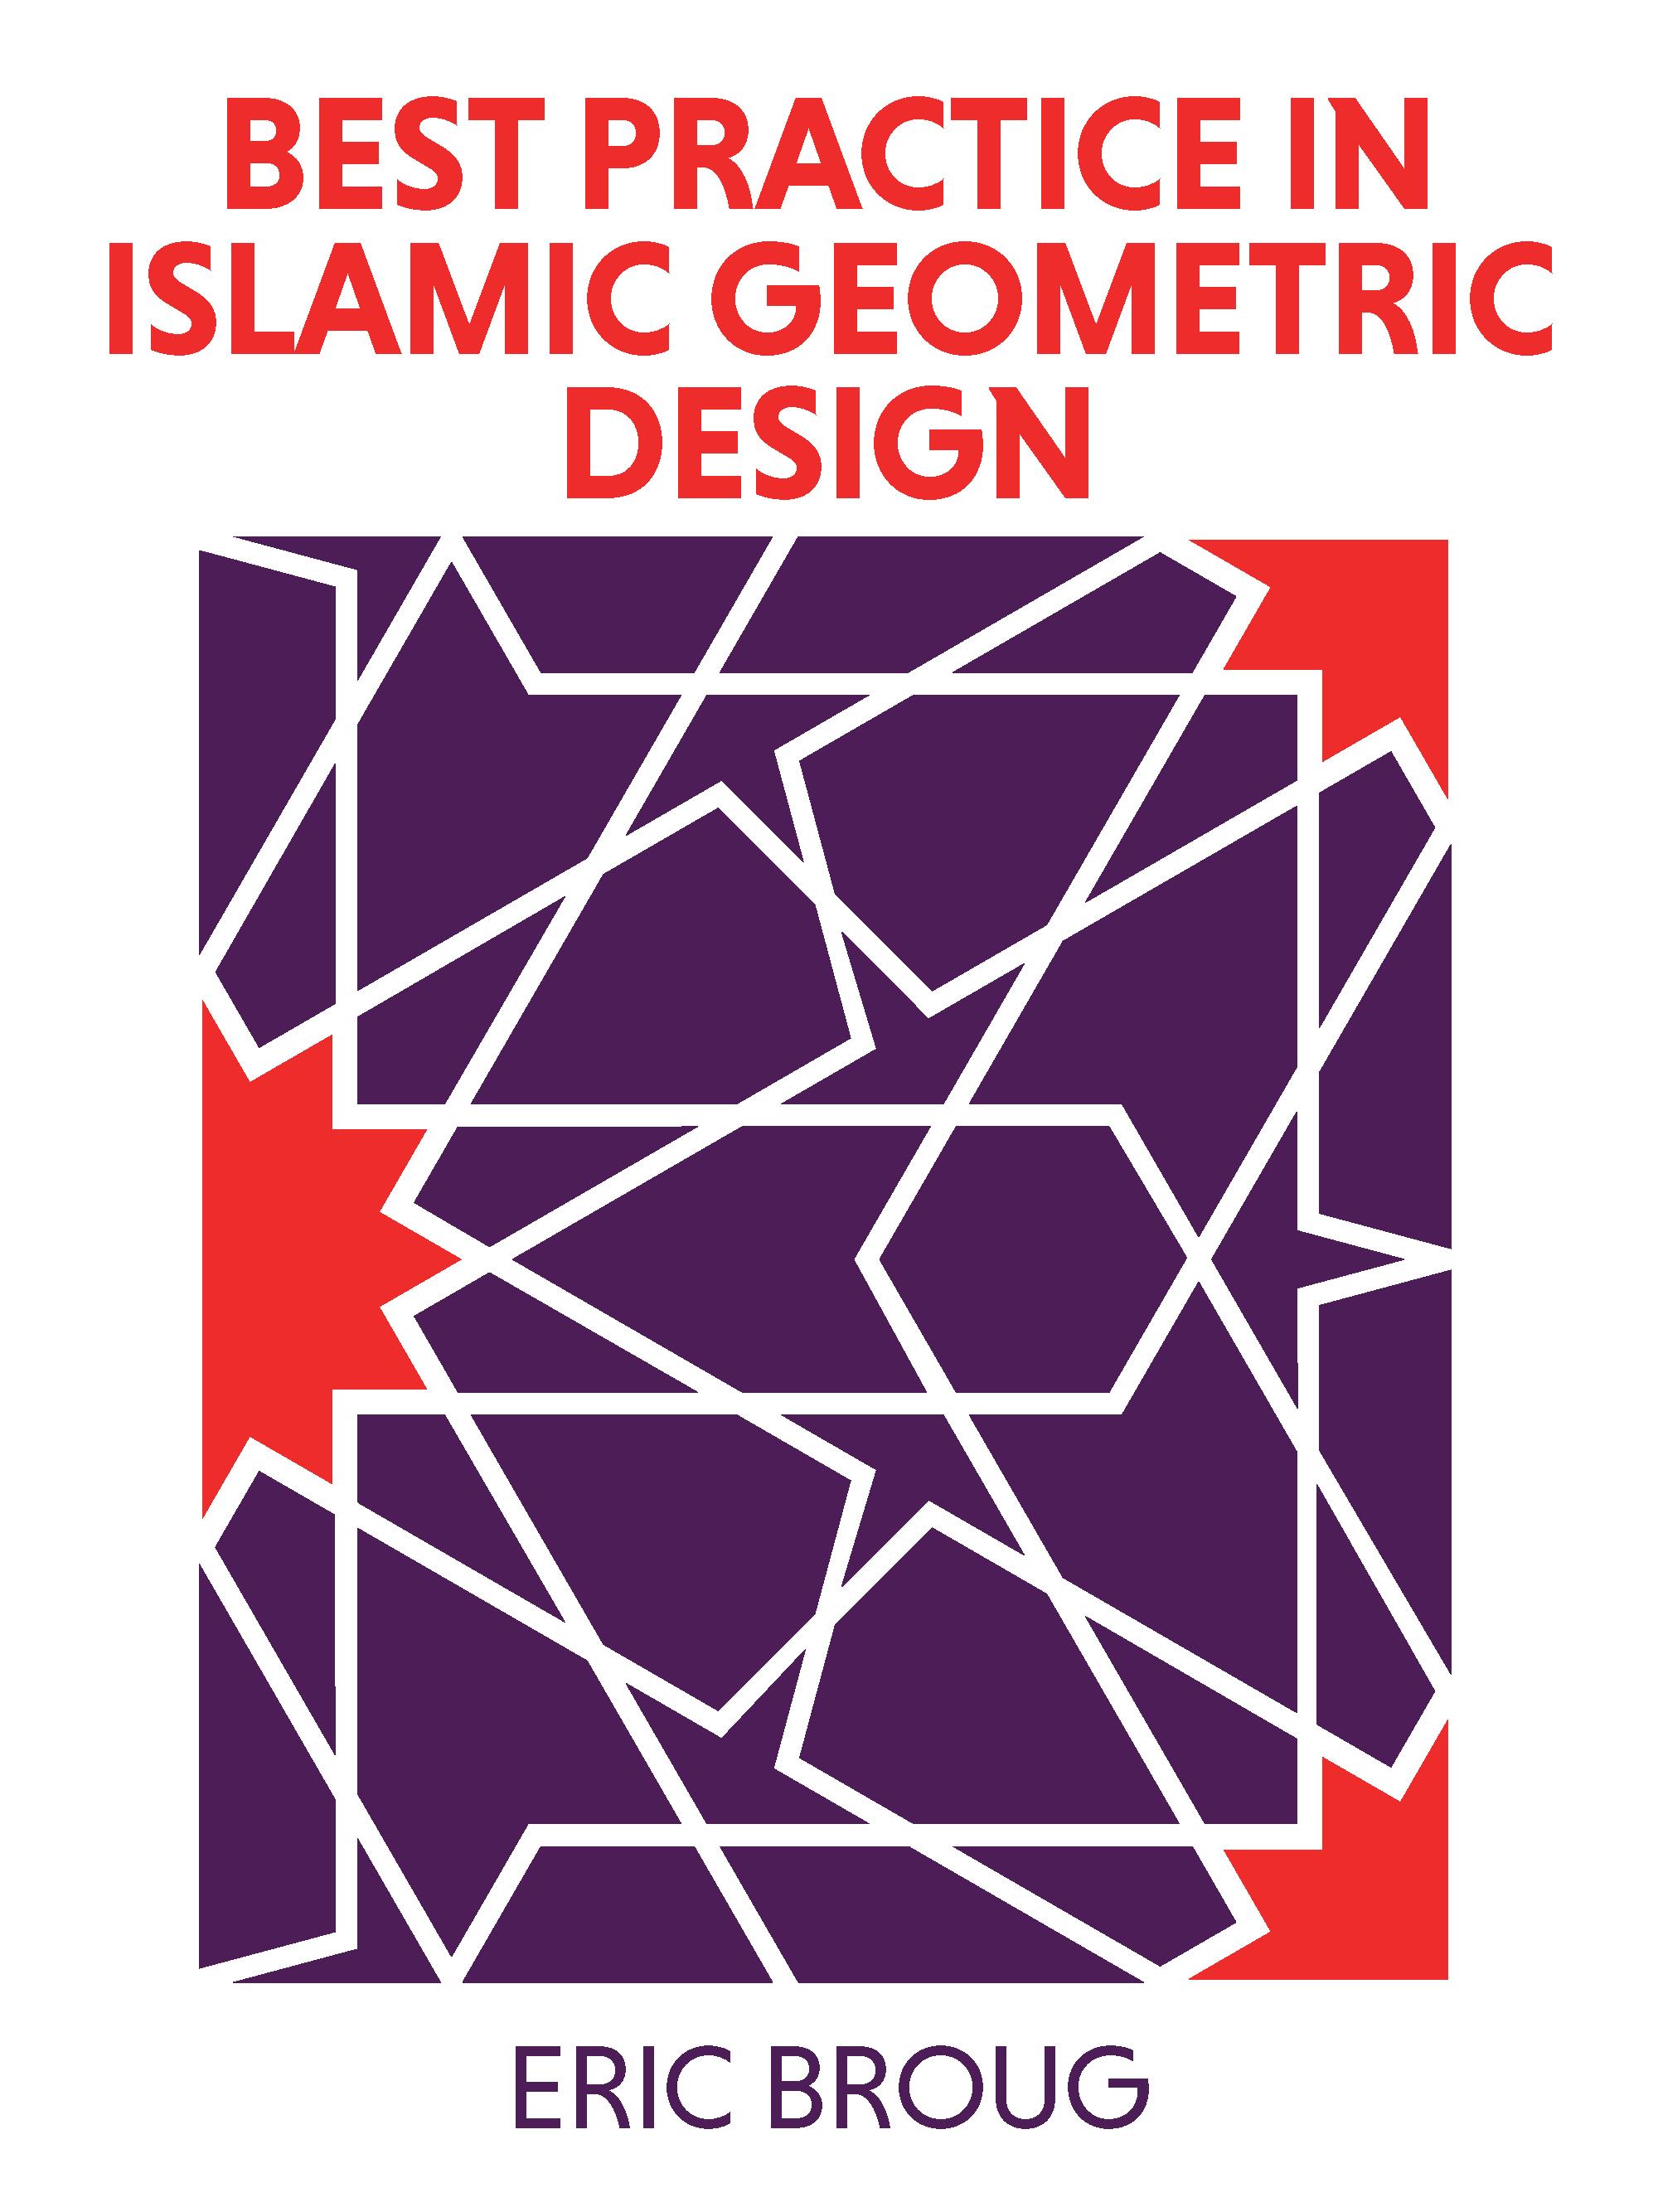 ebook: Best Practice in Islamic Geometric Design